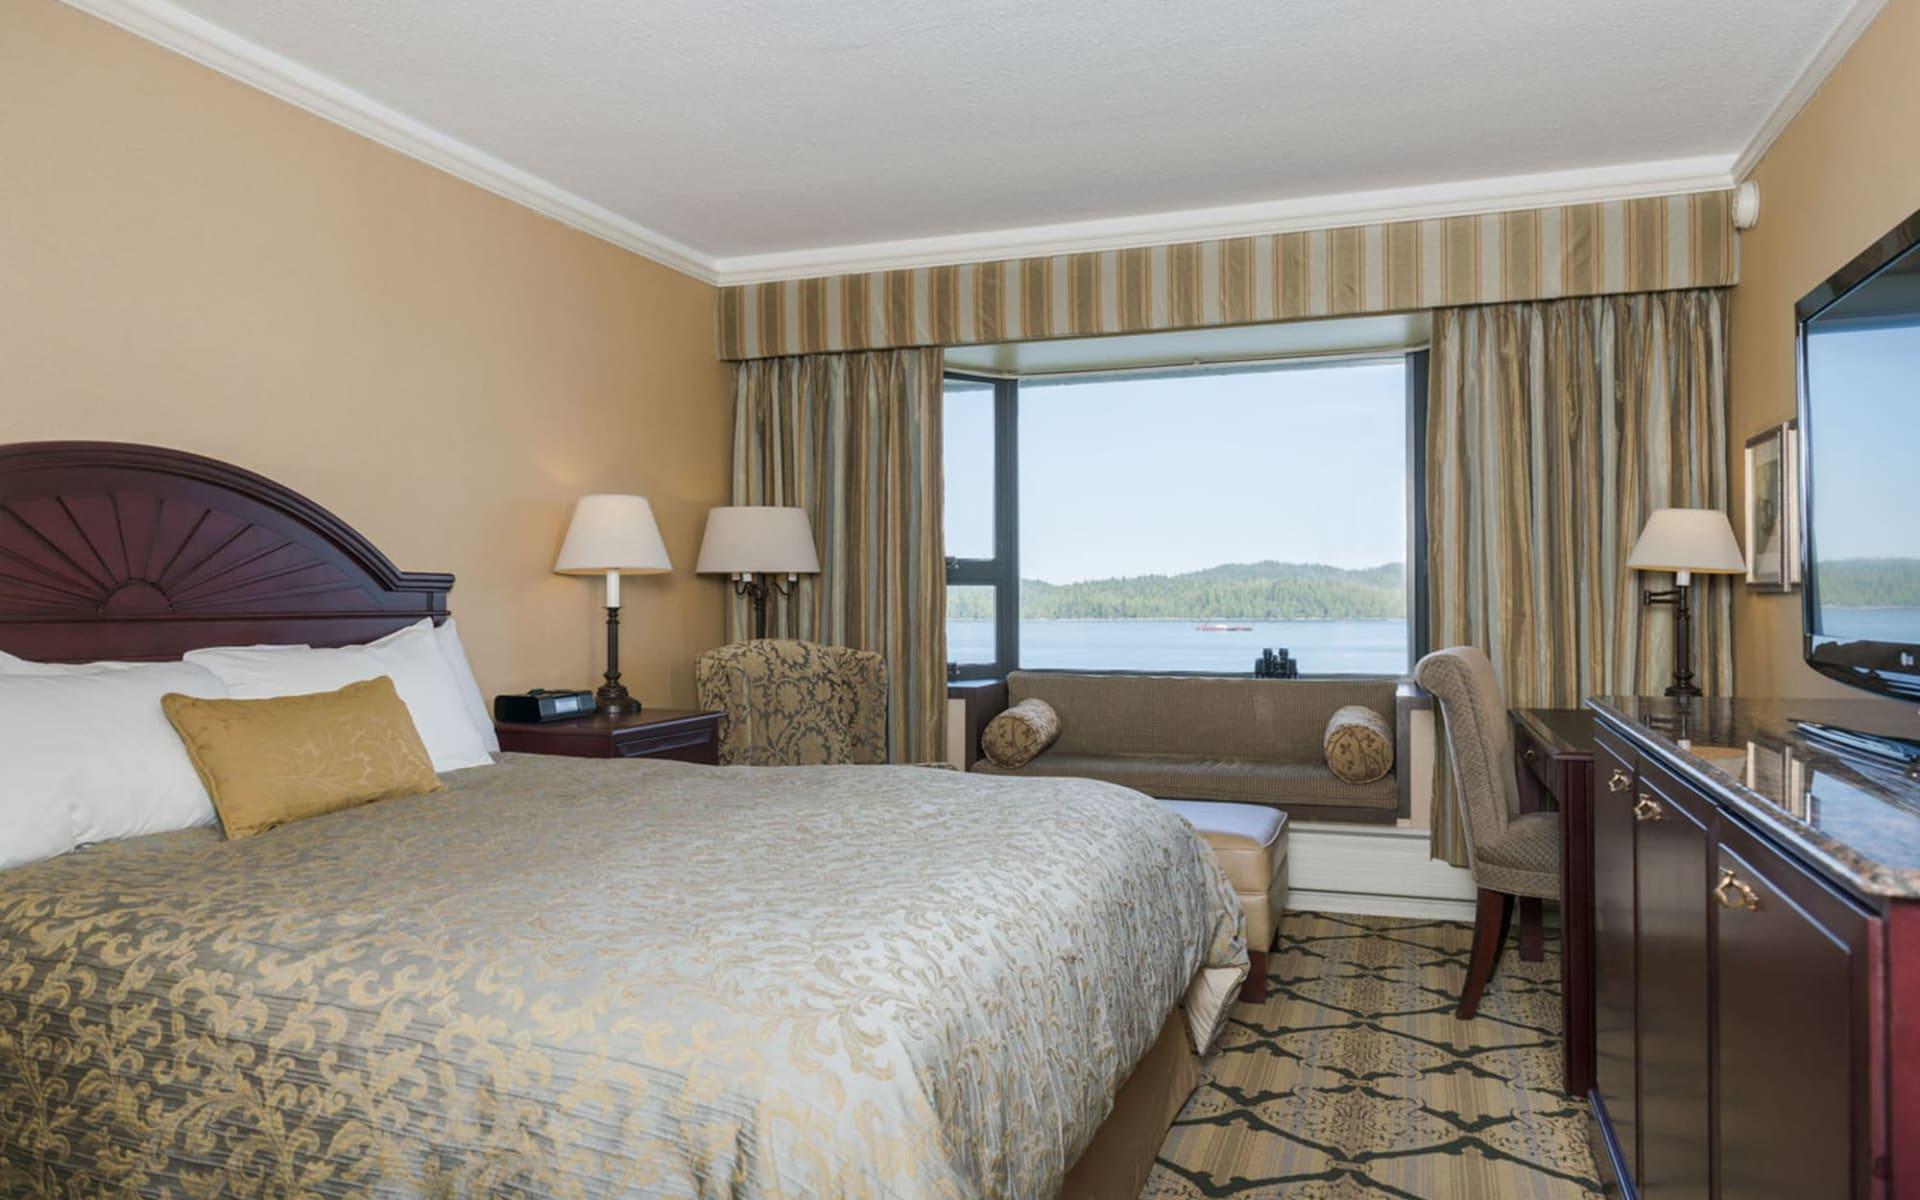 Prestige Hotel Prince Rupert:  Crest Hotel_CrestClassHarbourViewRoom(Standard)